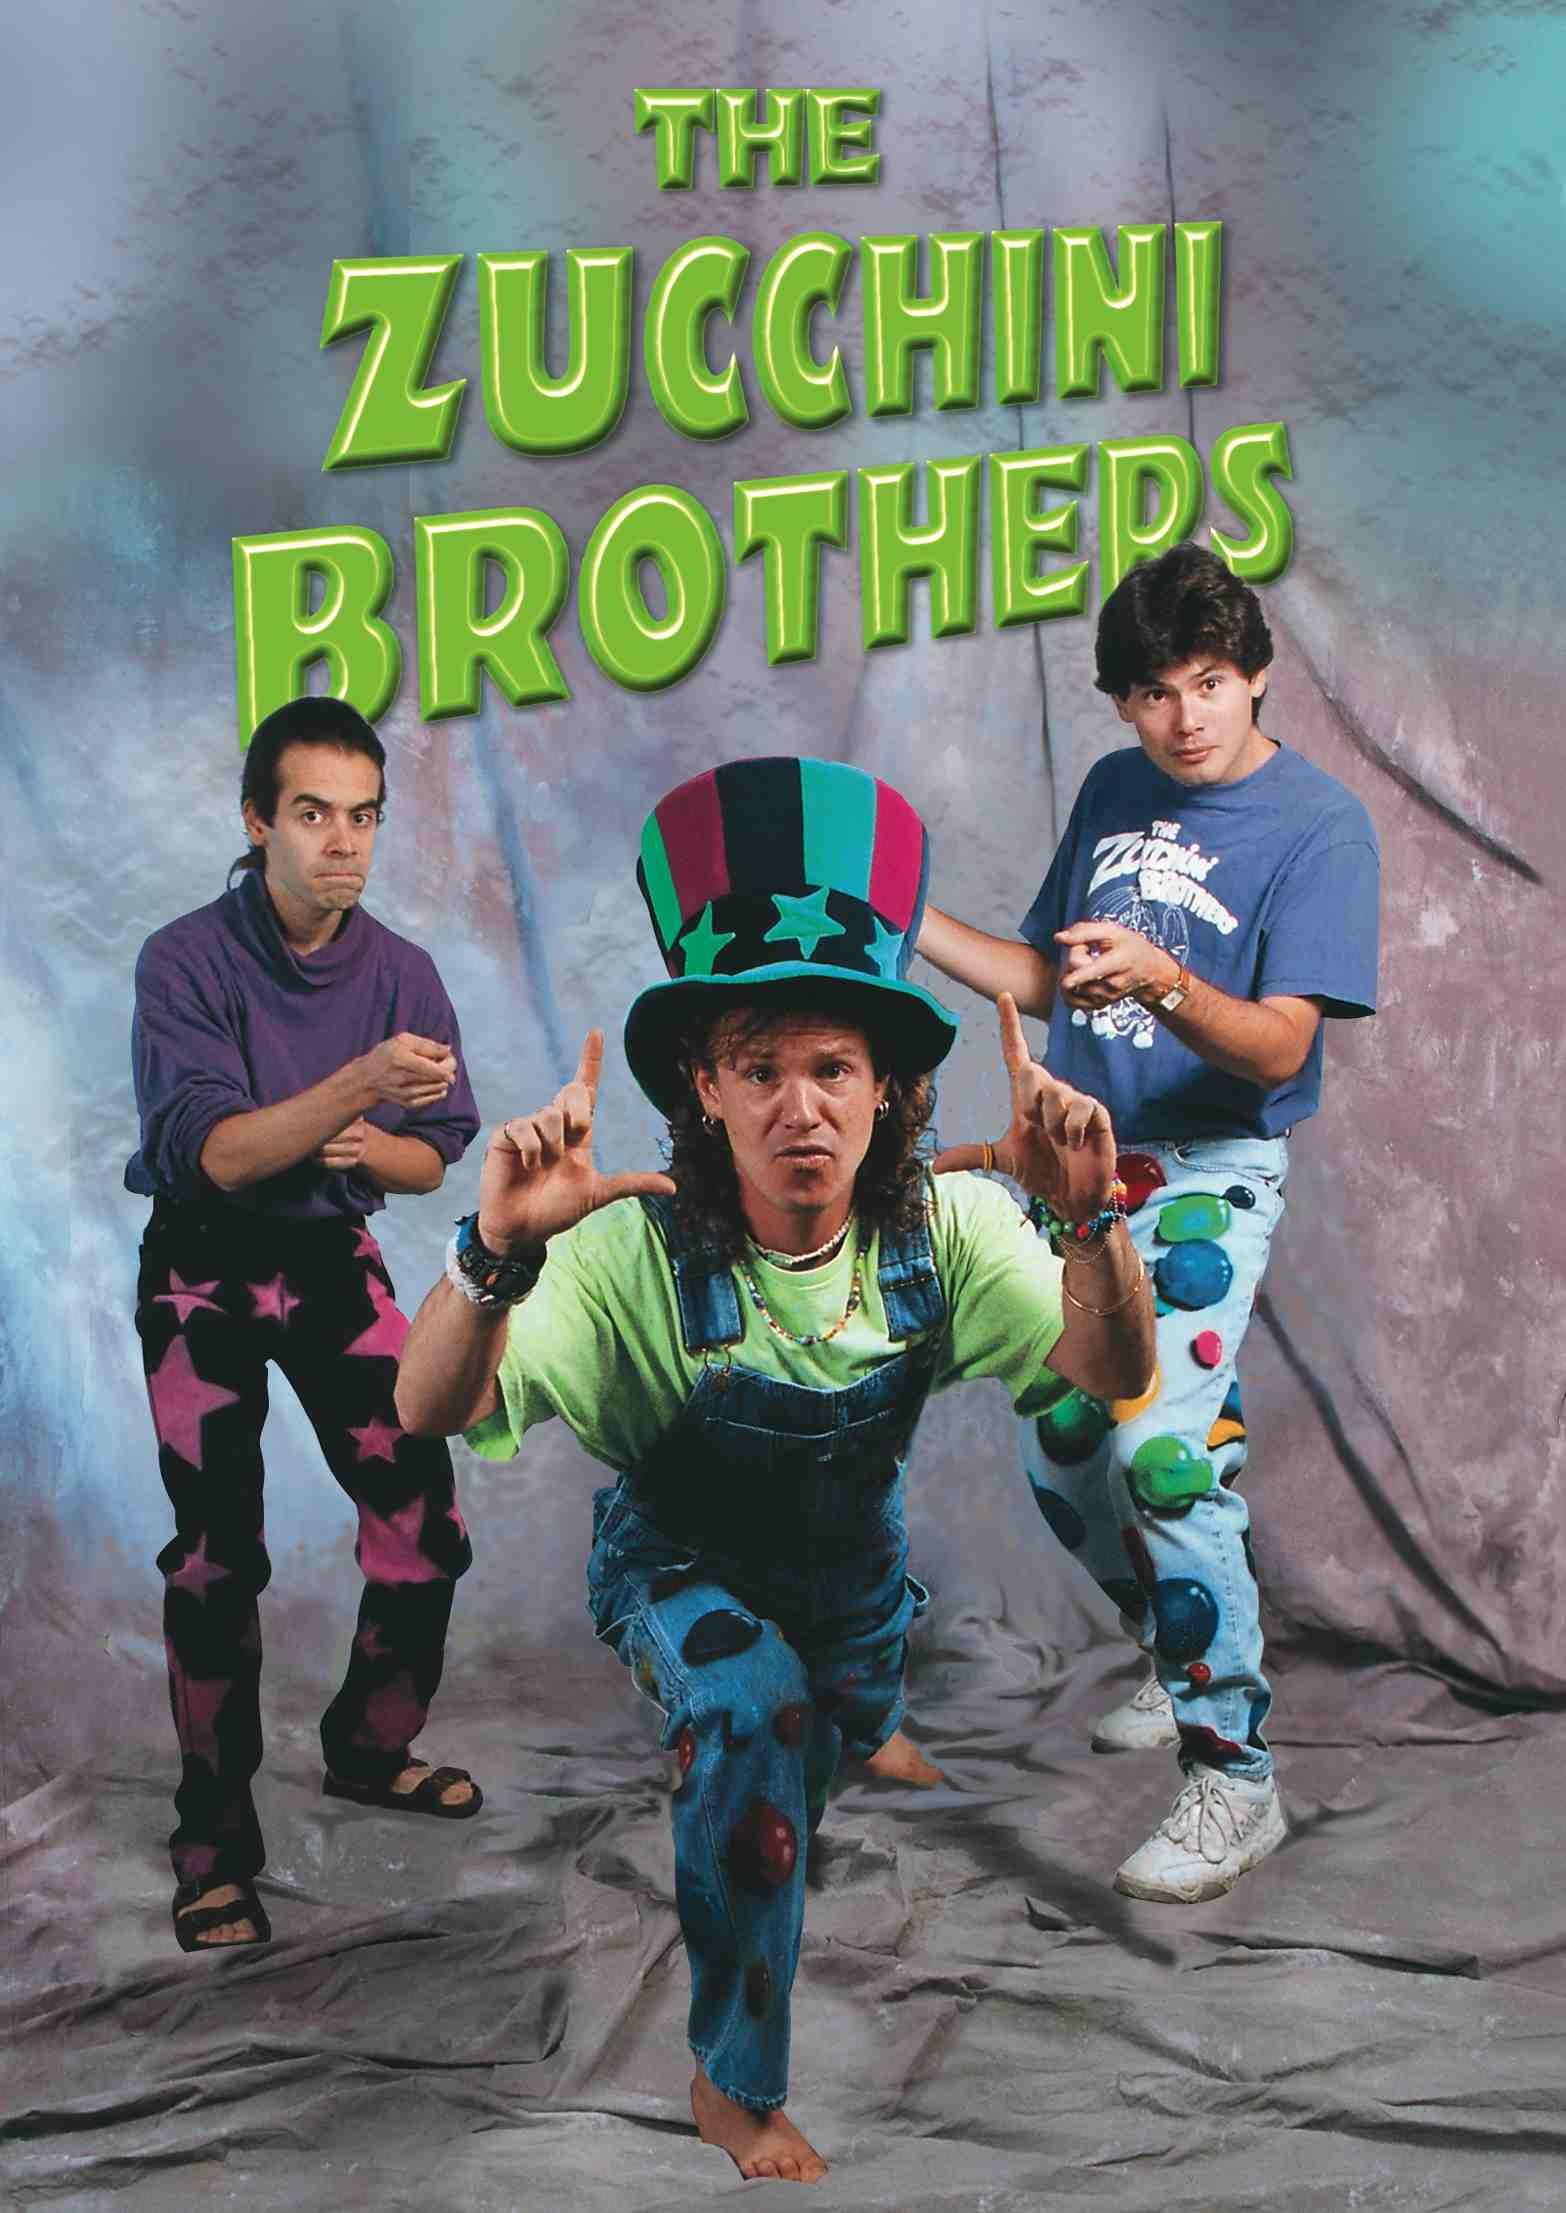 .zucchini brothers